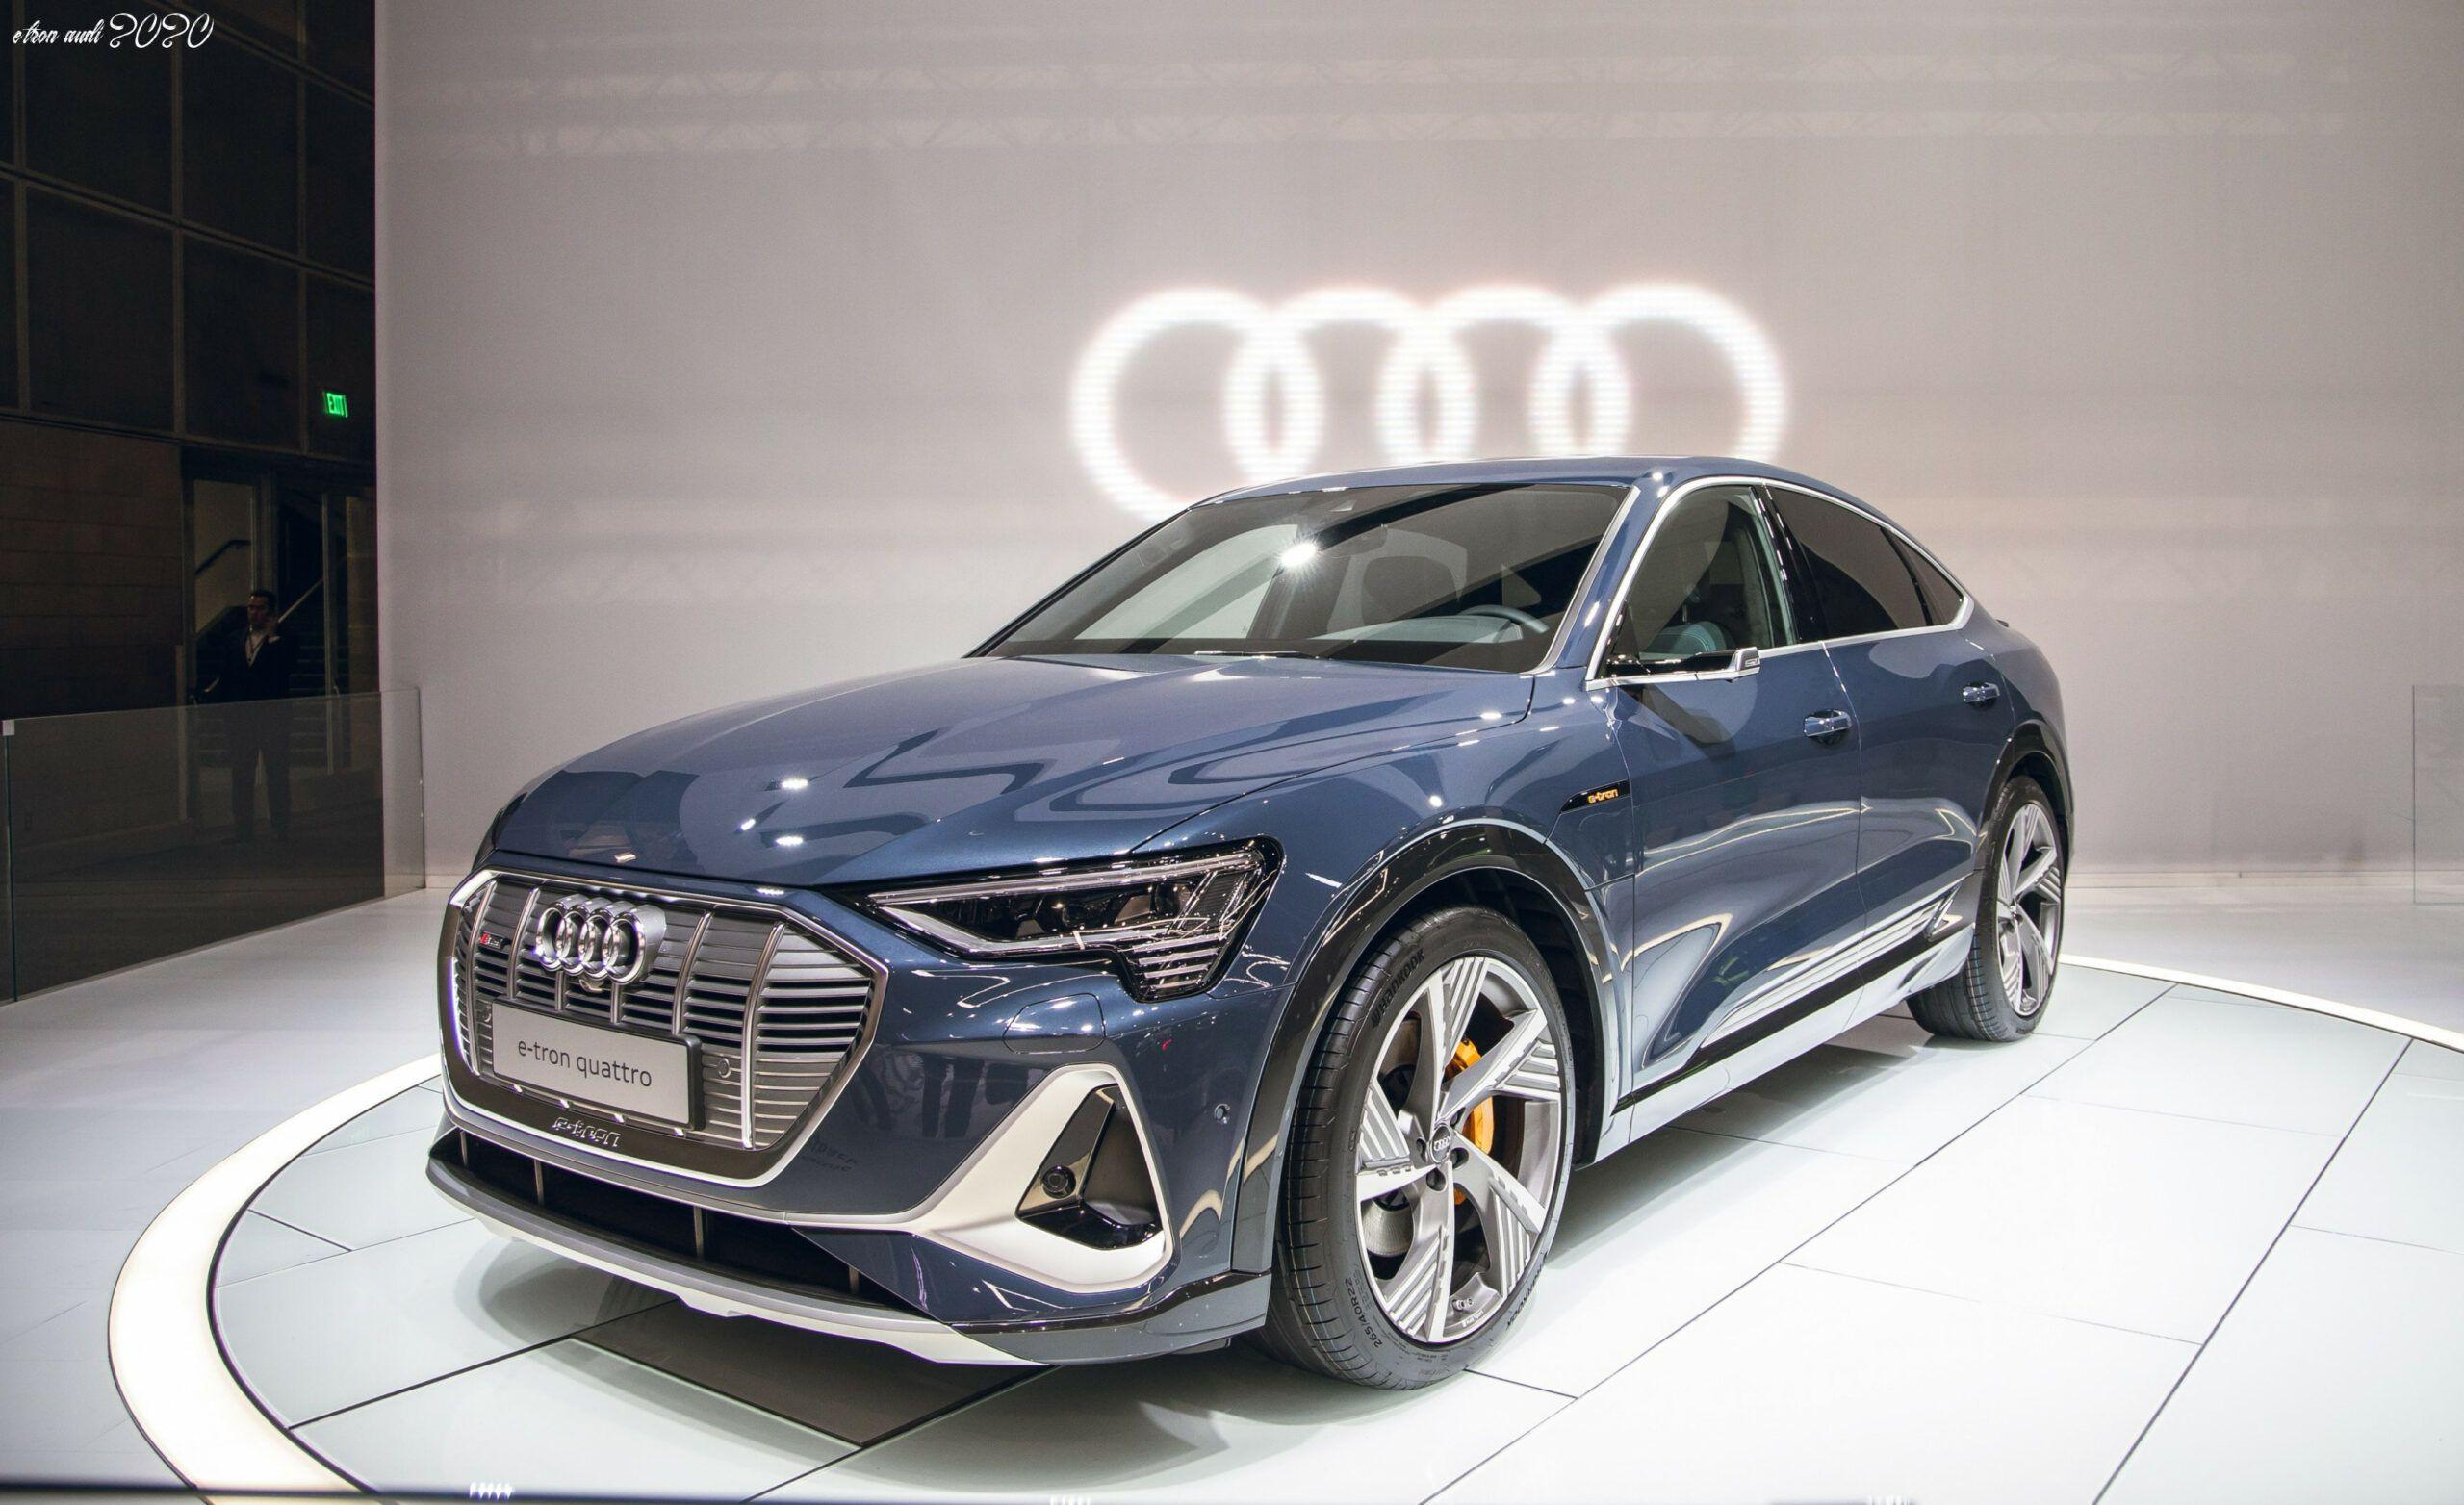 E Tron Audi 2020 in 2020 Audi etron, Audi, Etron